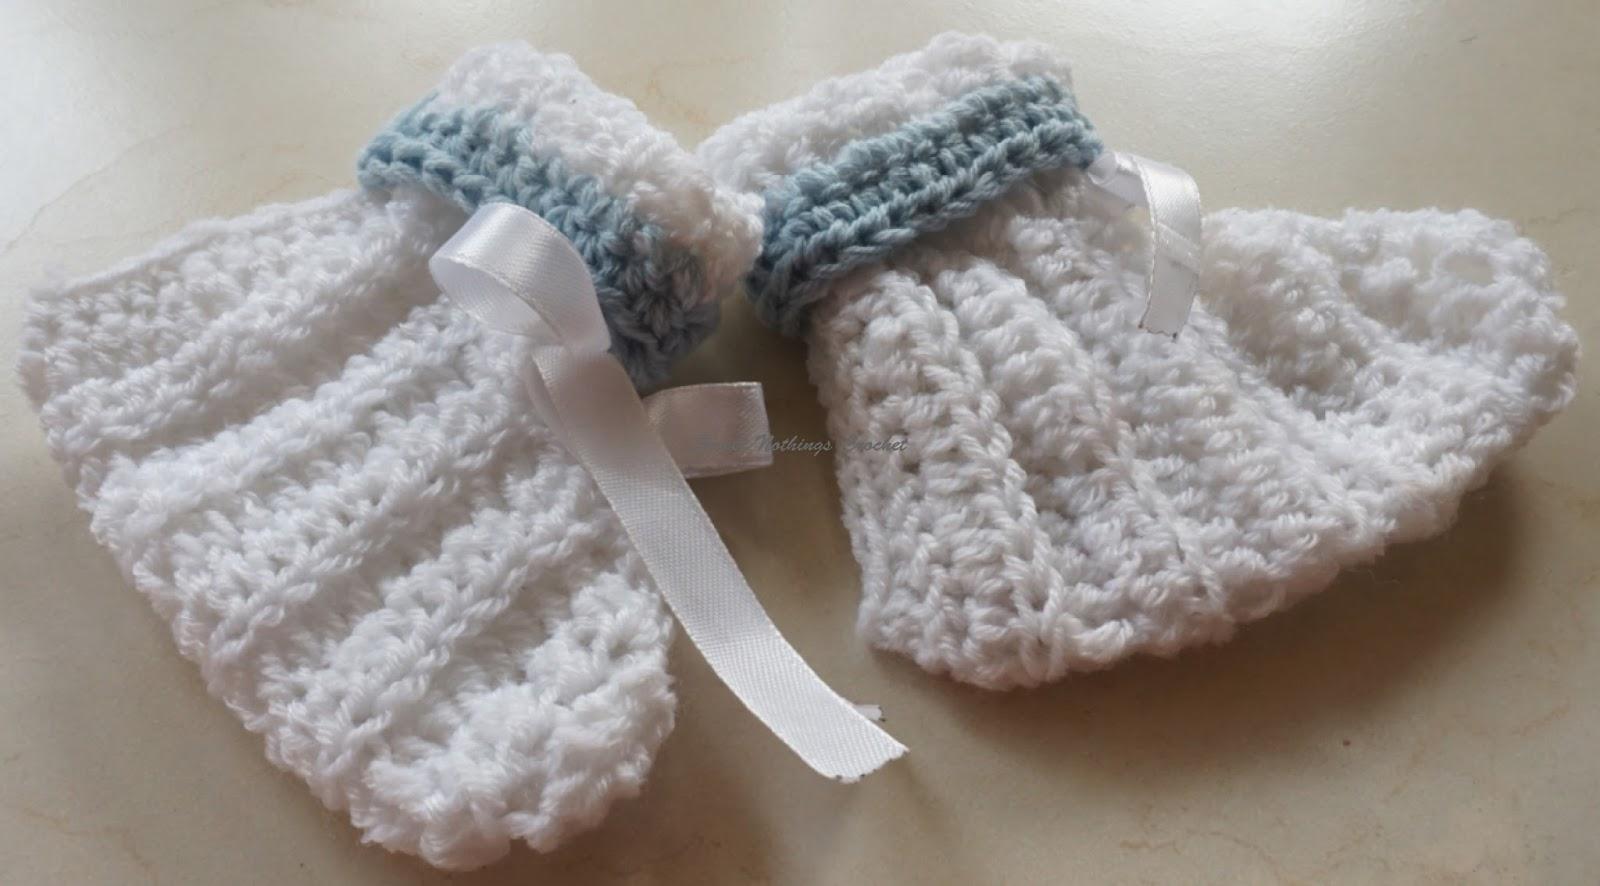 Sweet Nothings Crochet: BABY BOY JACKET with matching cap n socks